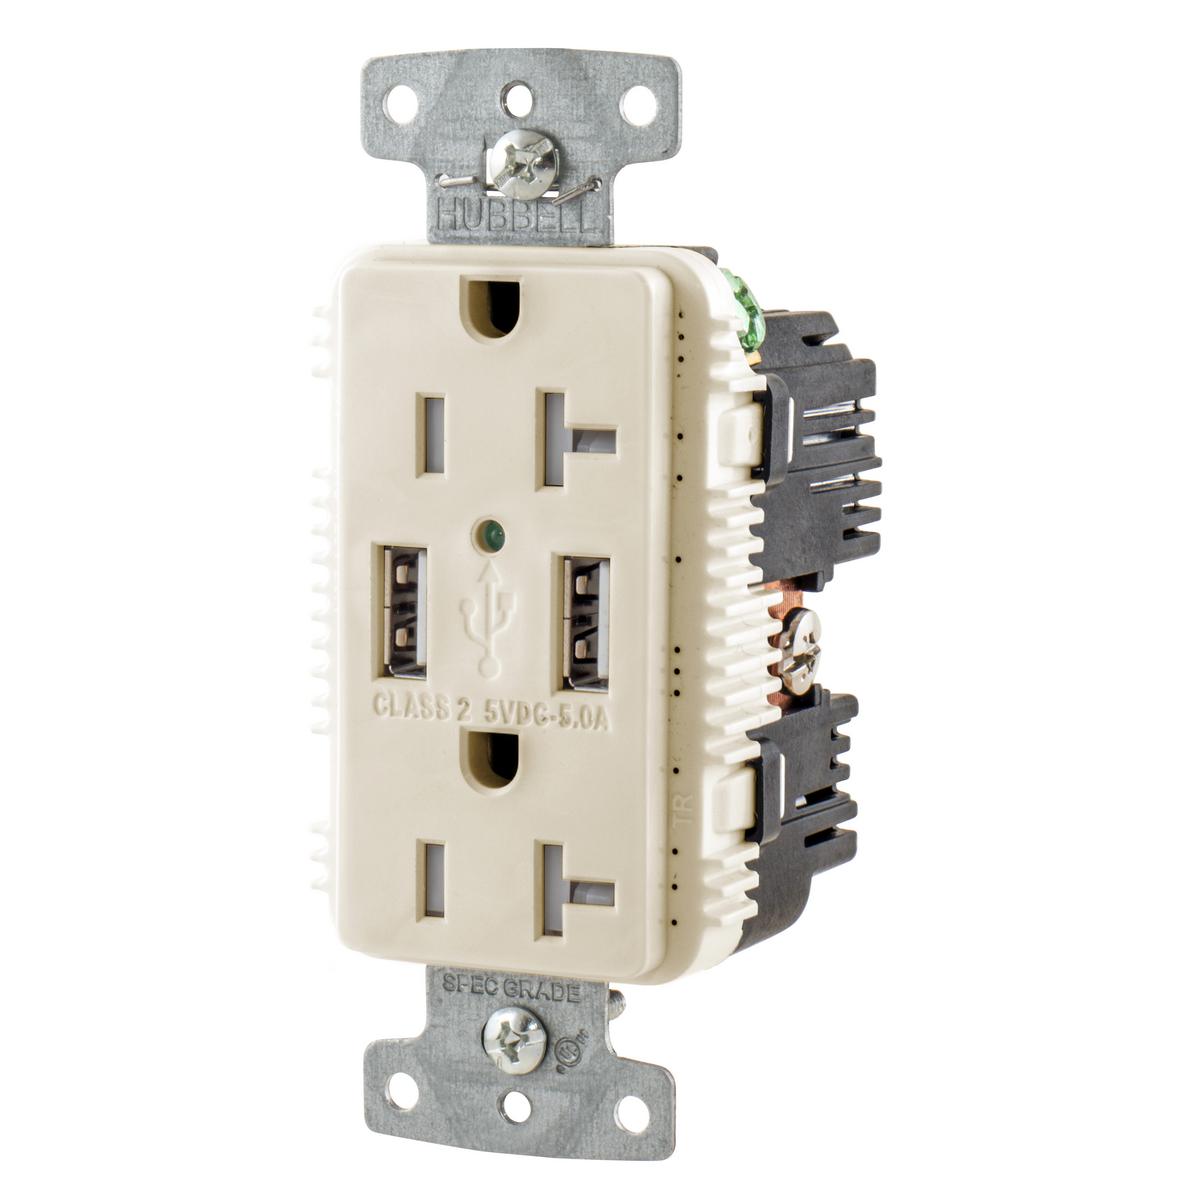 Hubbell USB20A5LA USB Charger Receptacle